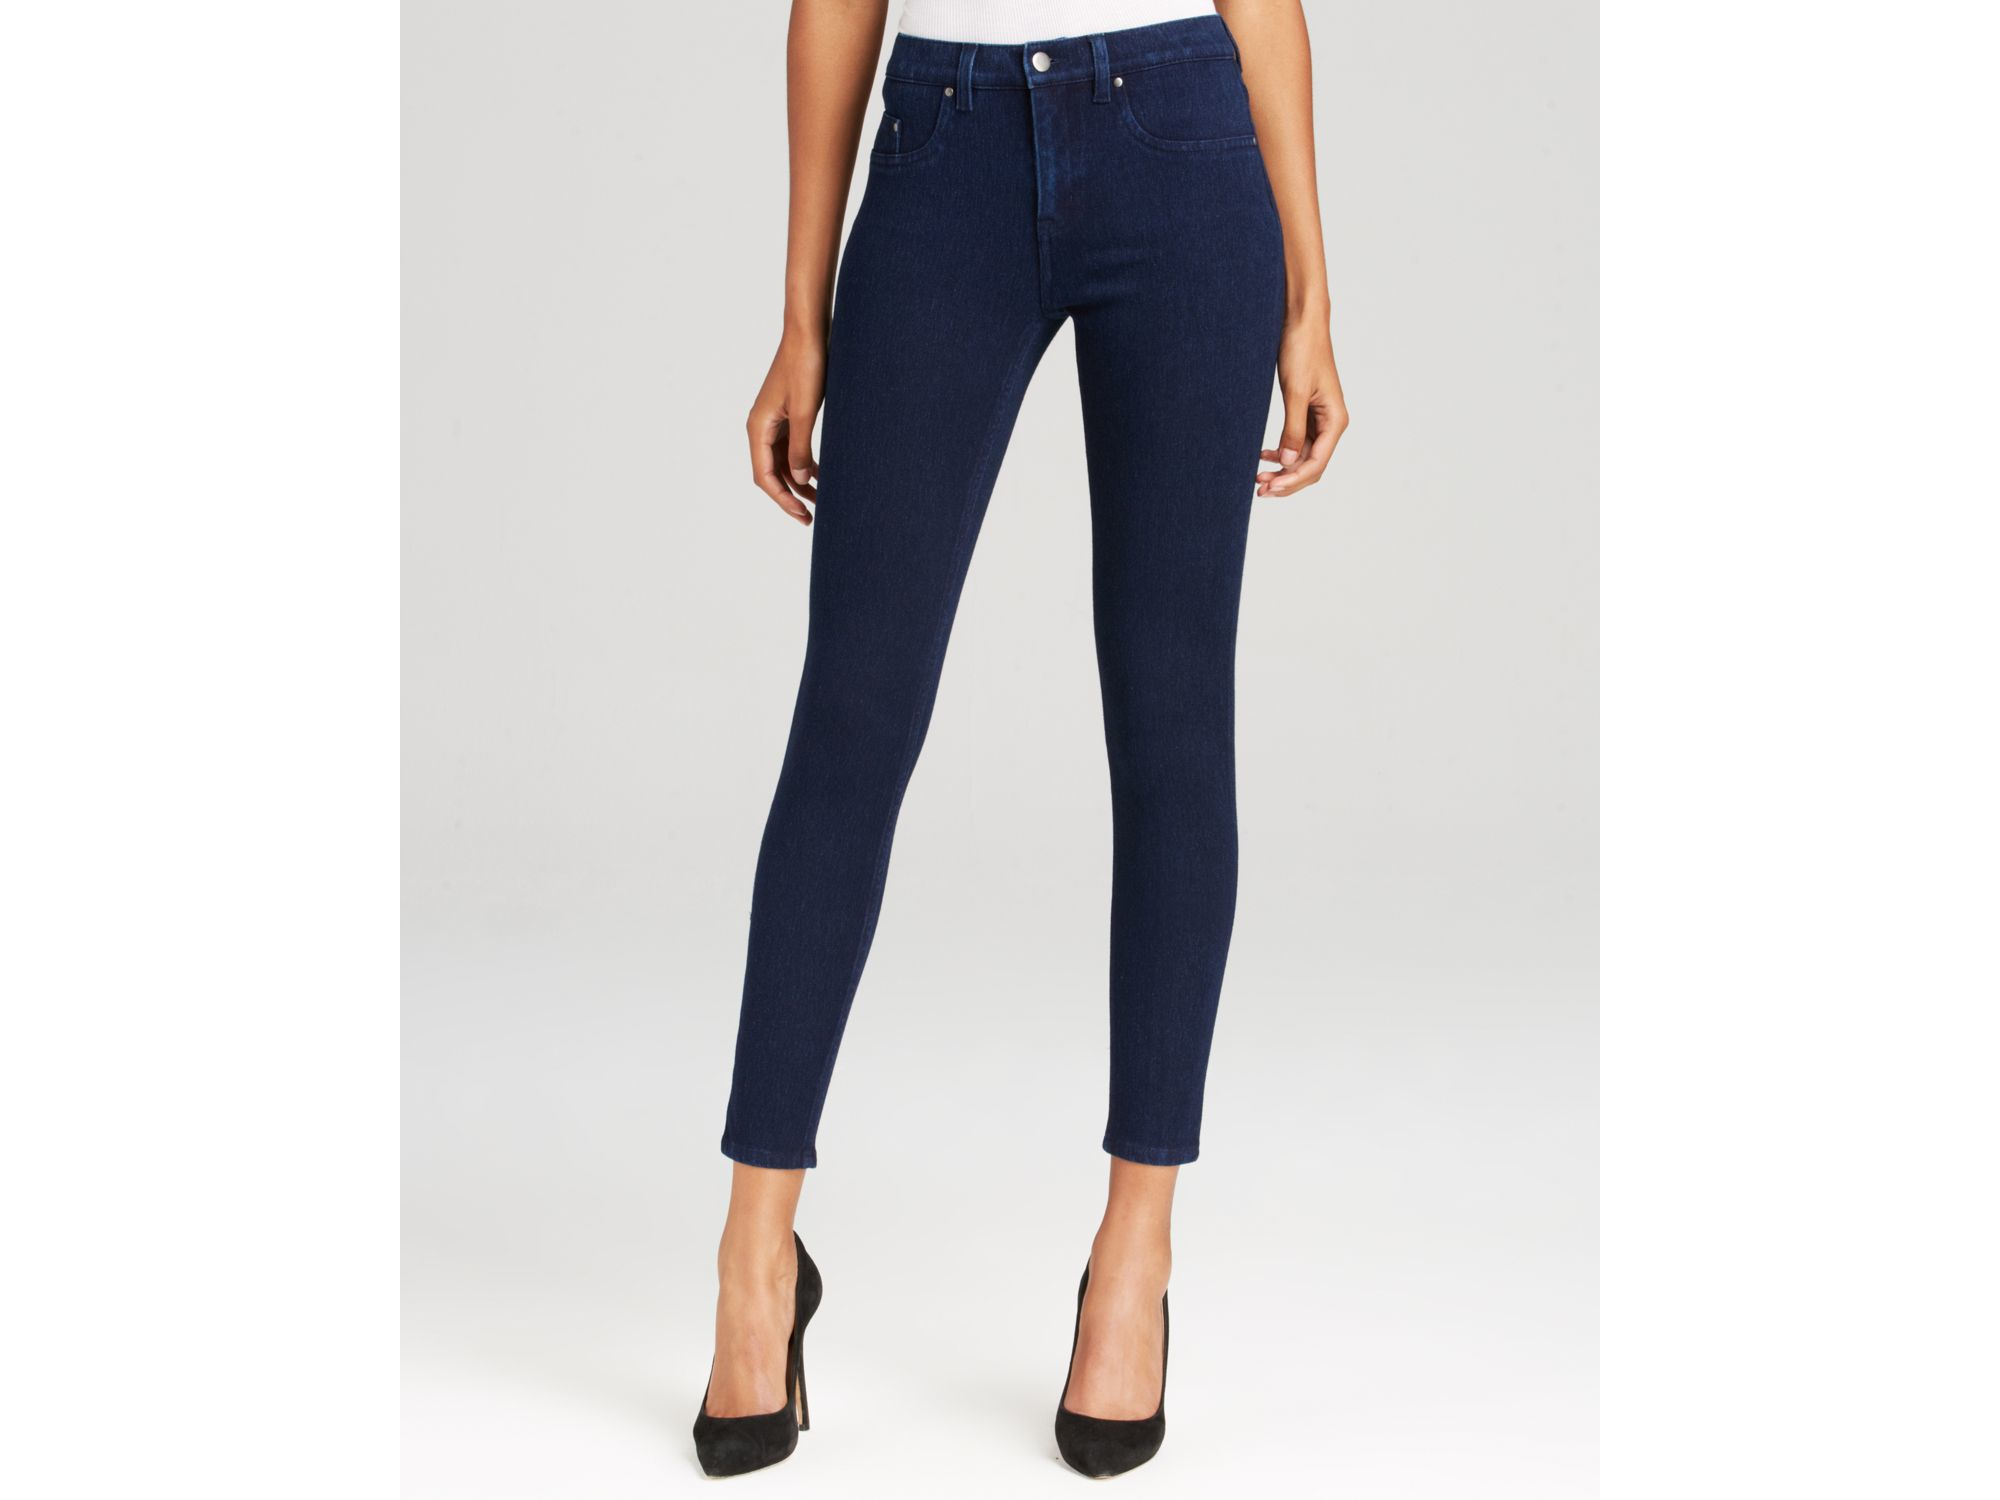 Spanx Spanx® Denim Super Skinny Jeans In Indigo Rinse in Blue | Lyst